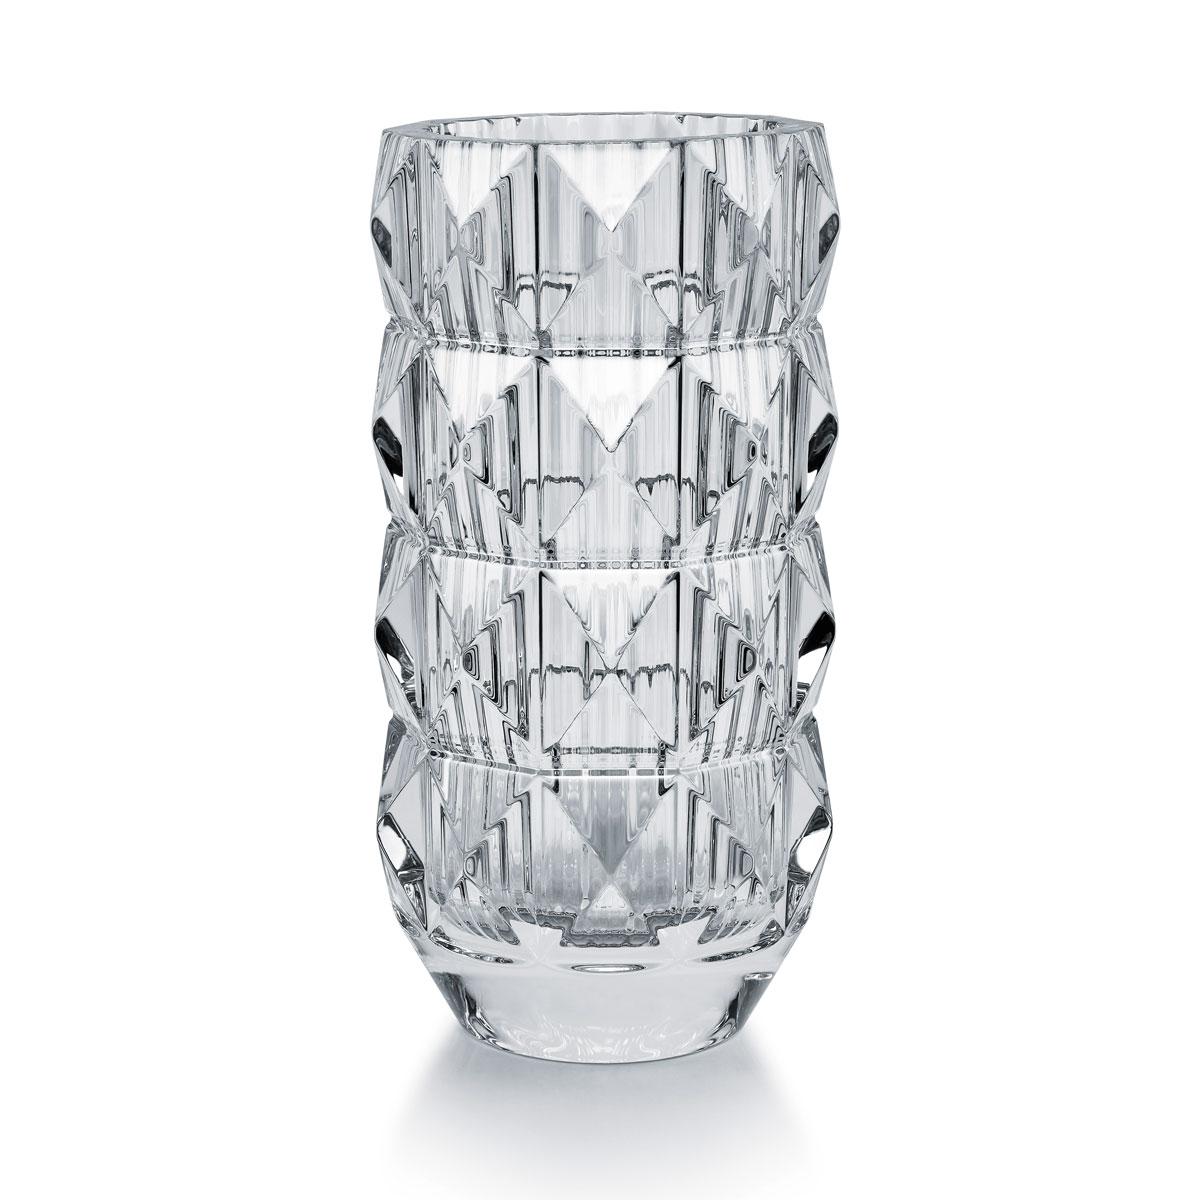 "Baccarat Crystal Louxor Round 16 1/2"" Vase"